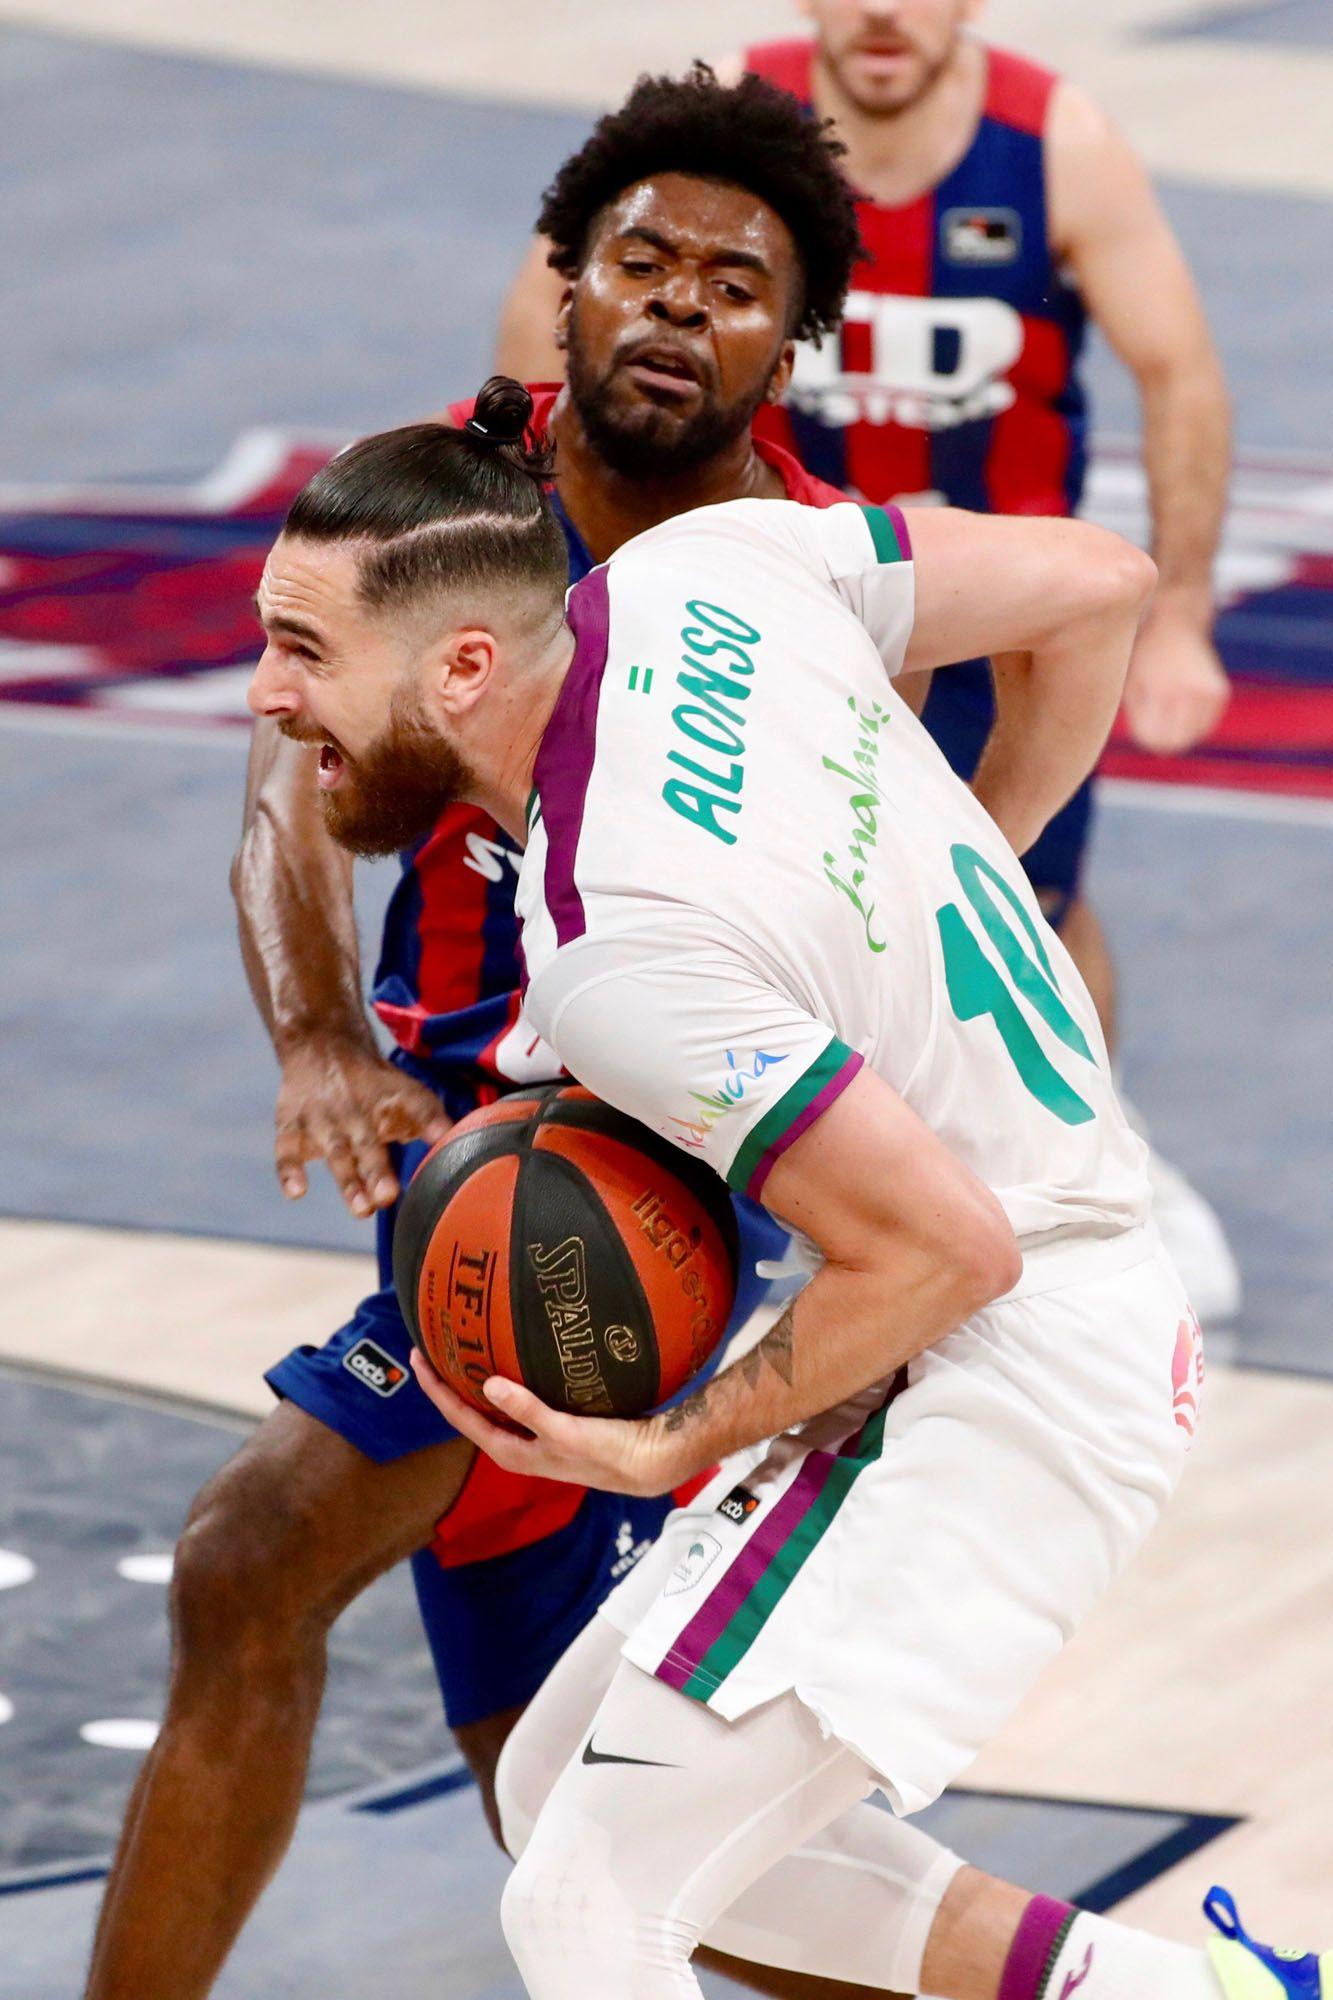 Las imágenes del Baskonia - Unicaja de la Liga Endesa.